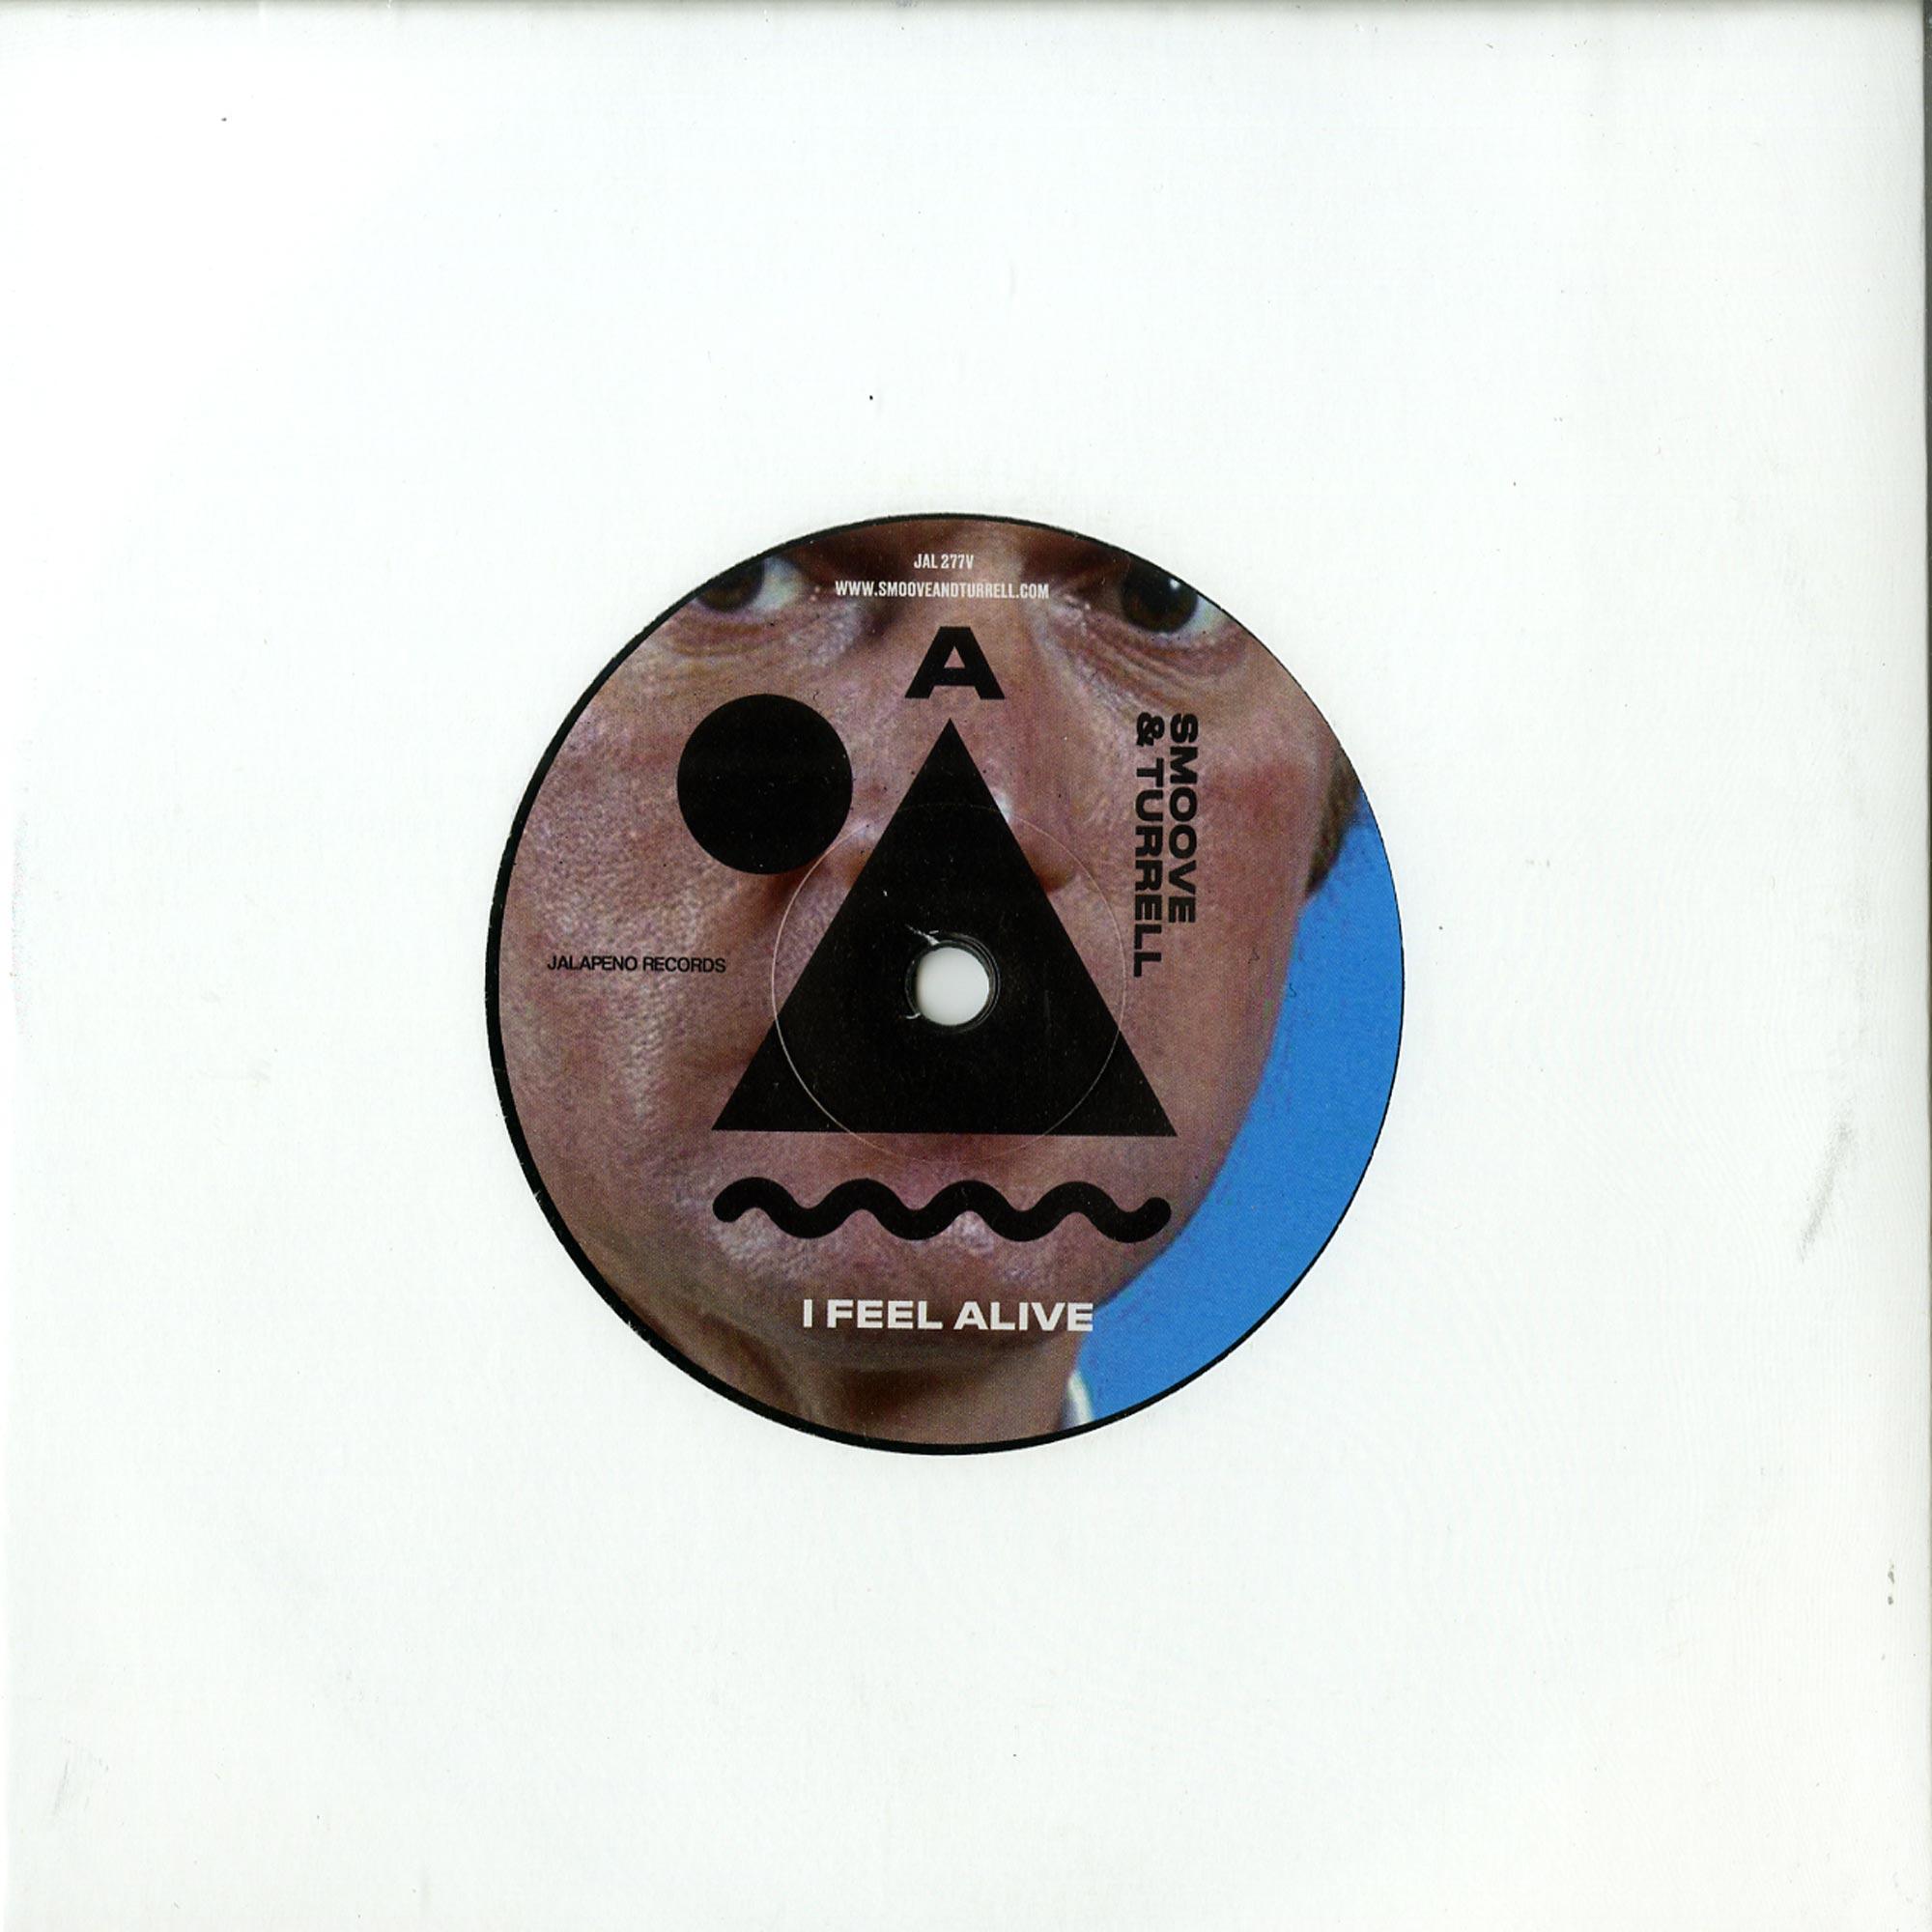 Smoove & Turrell - I FEEL ALIVE / MR HYDE